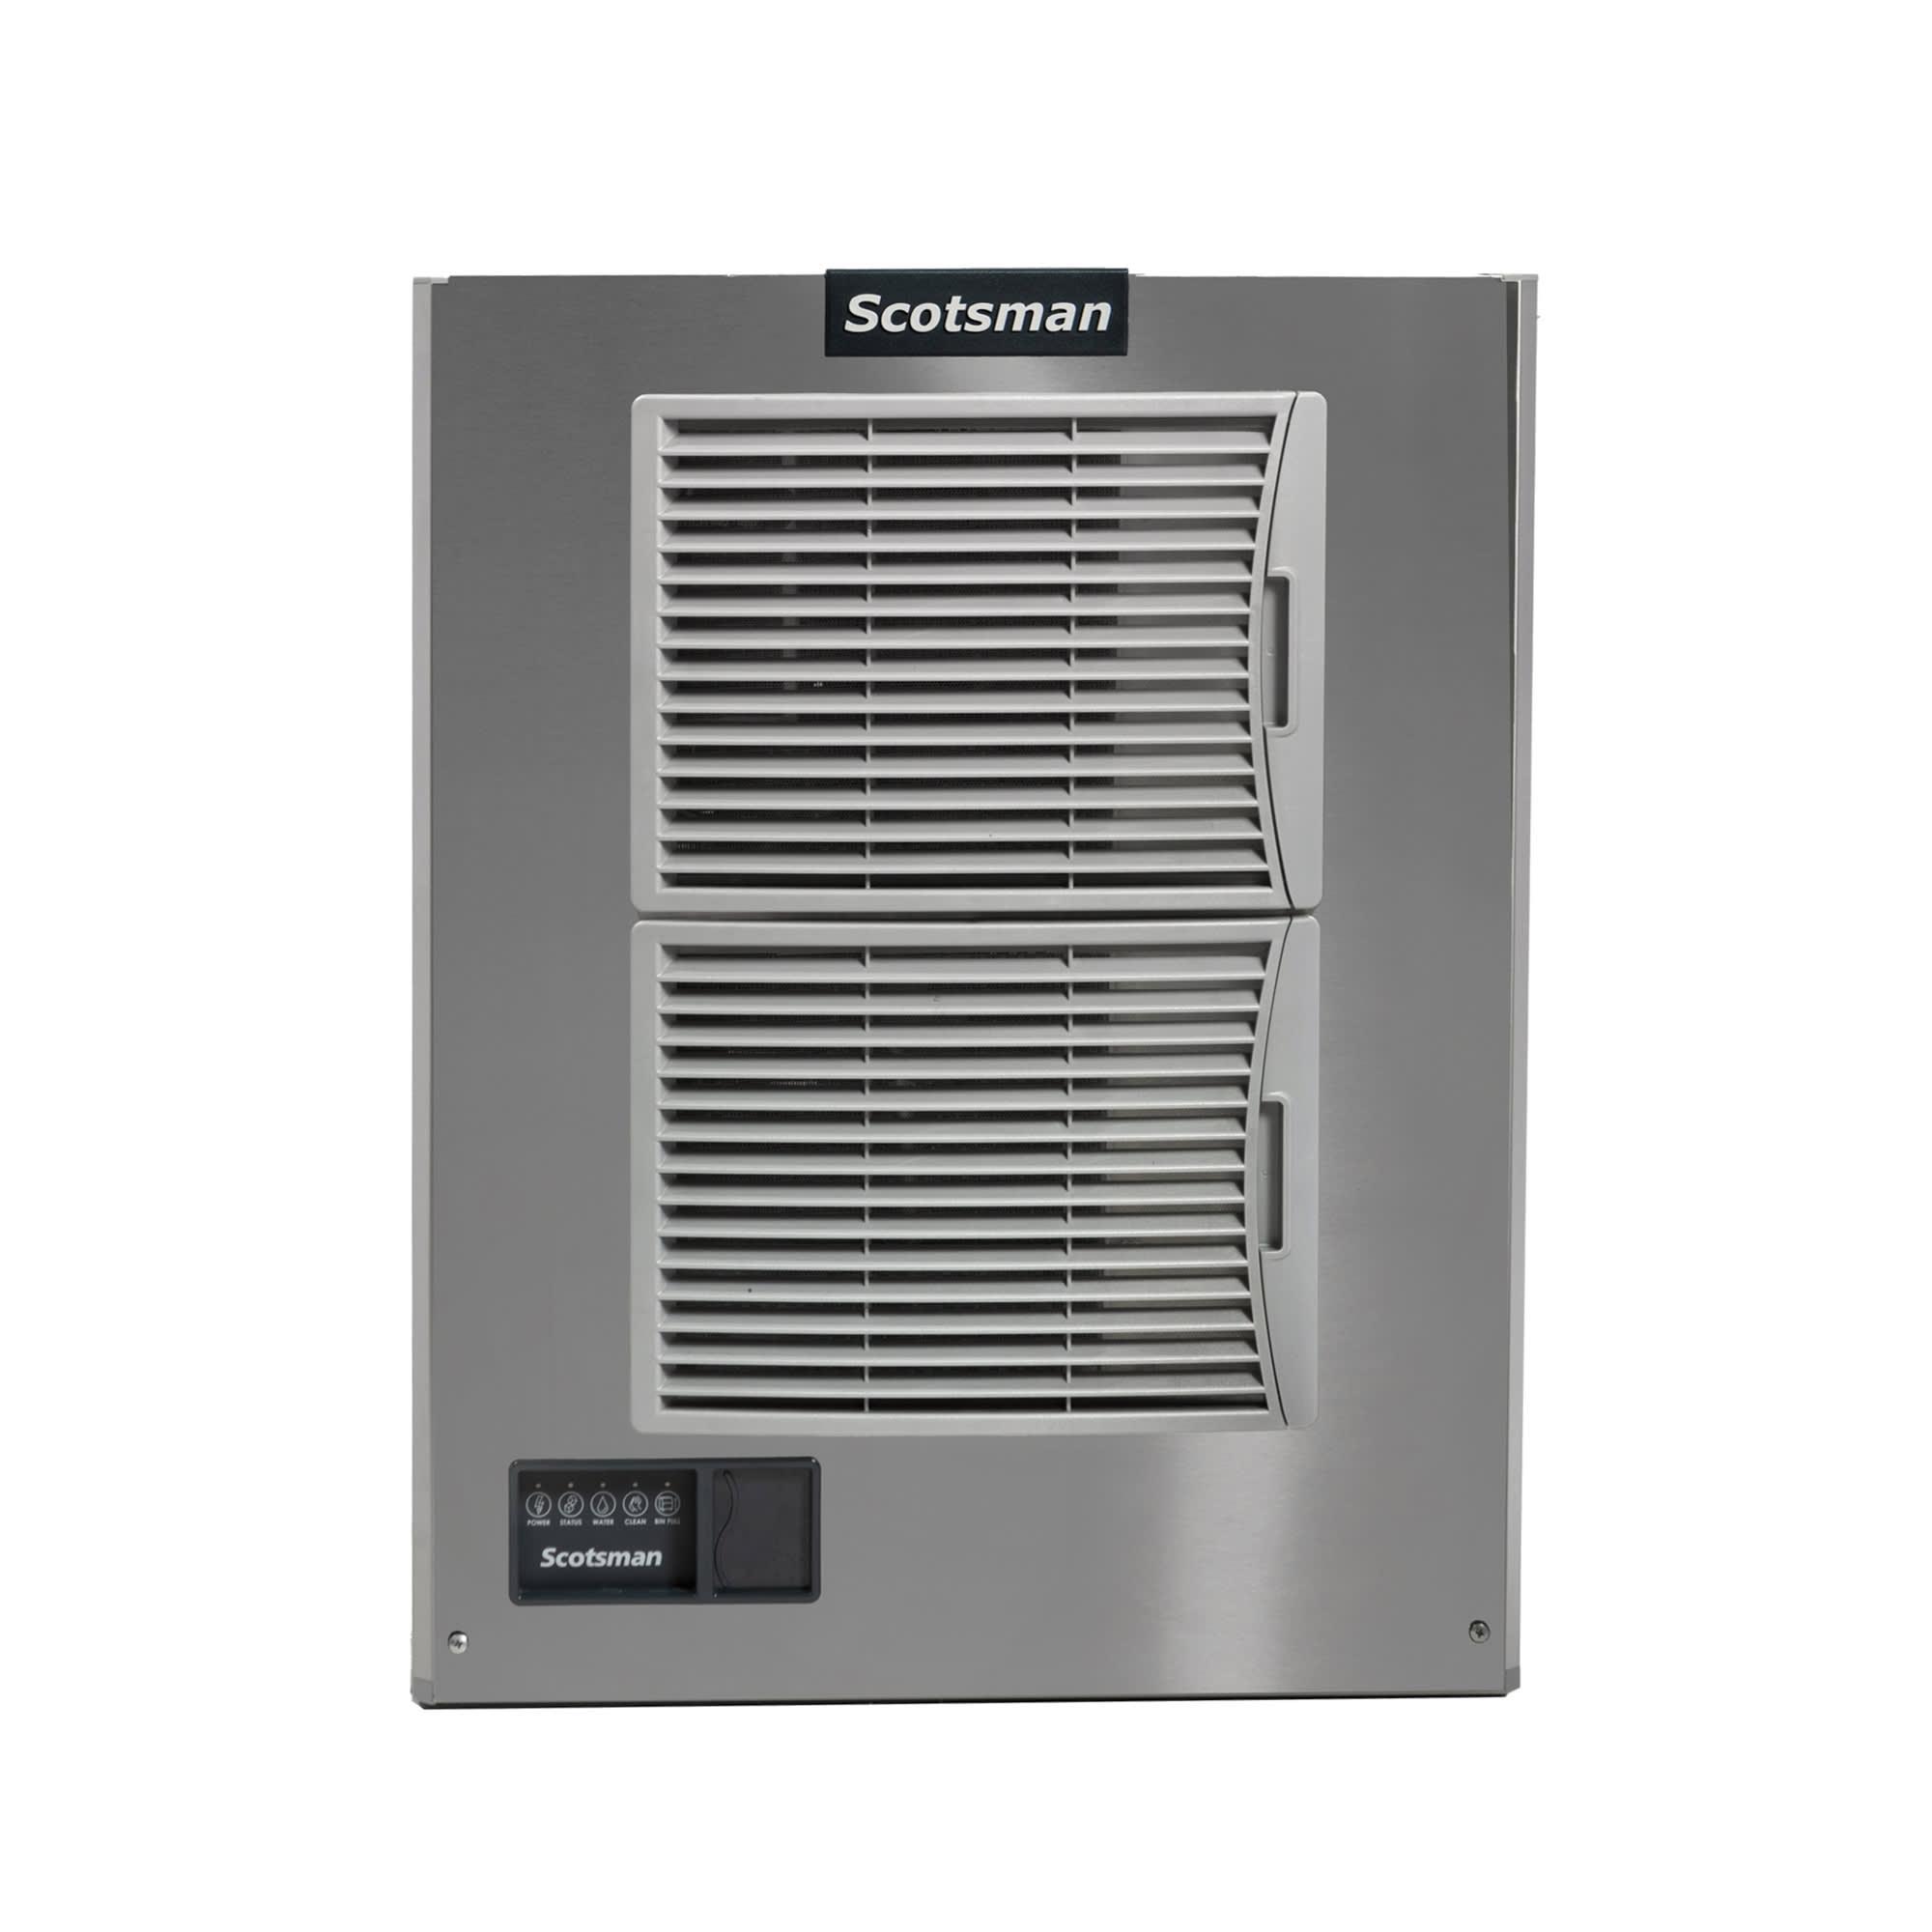 "Scotsman C0722MA-32 22"" Prodigy Plus® Full Cube Ice Machine Head - 758 lb/day, Air Cooled, 208 230v/1ph"